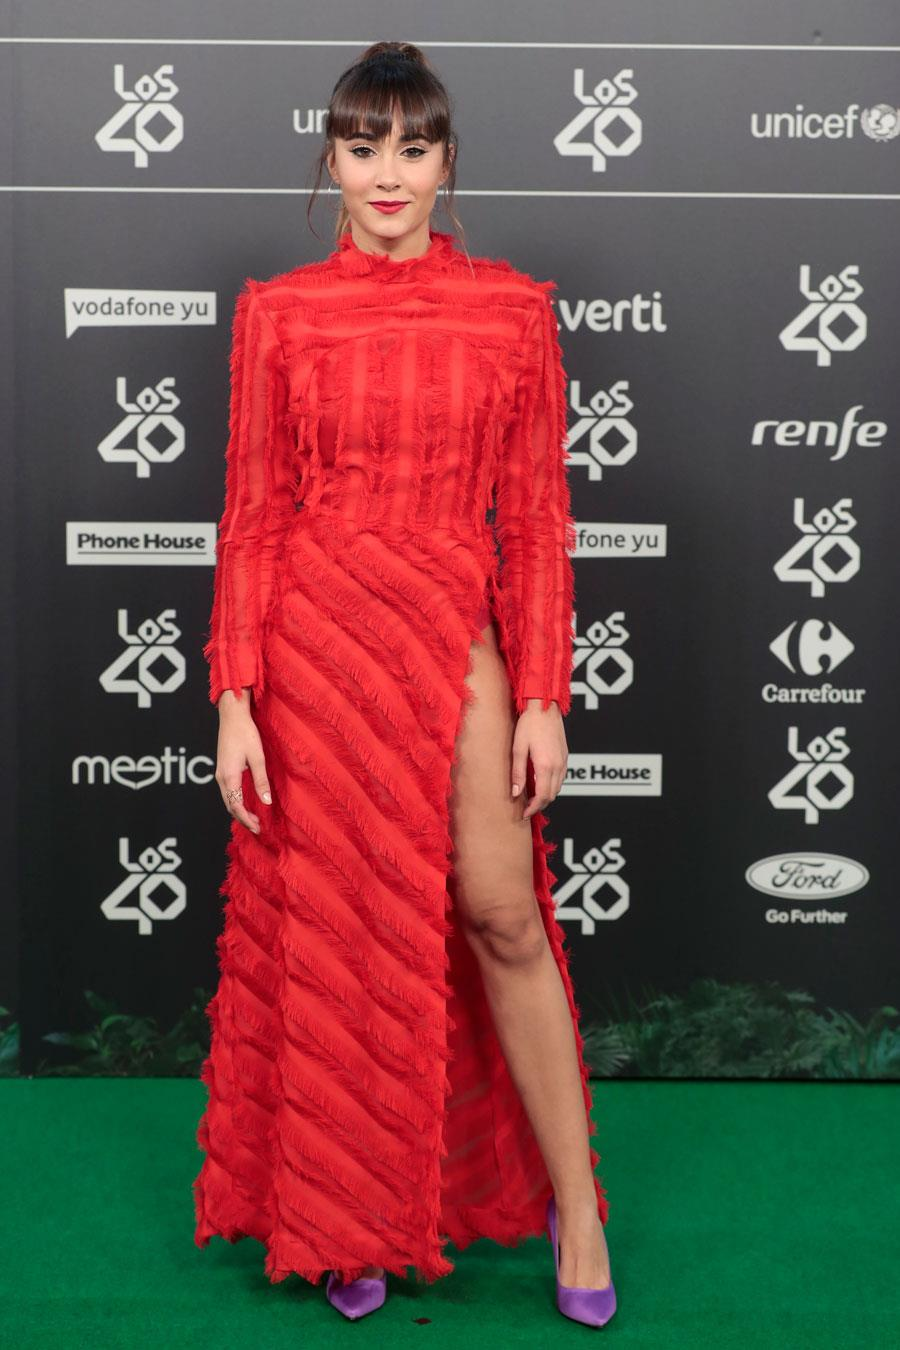 ee4109d6e como-combinar-un-vestido-rojo-aitana. Vestido rojo con abertura